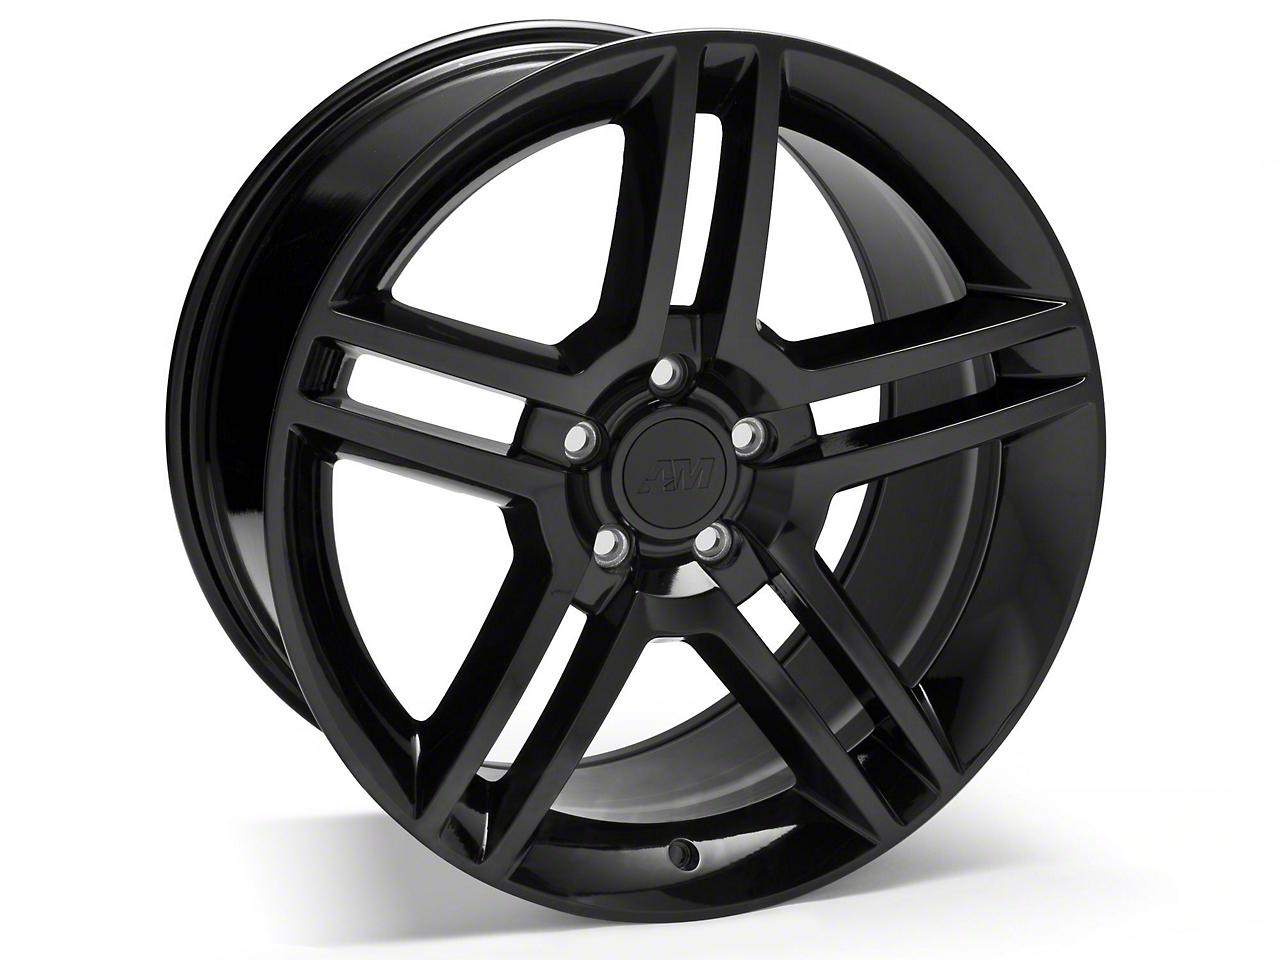 2010 GT500 Black Wheel - 19x10 (05-14 All)